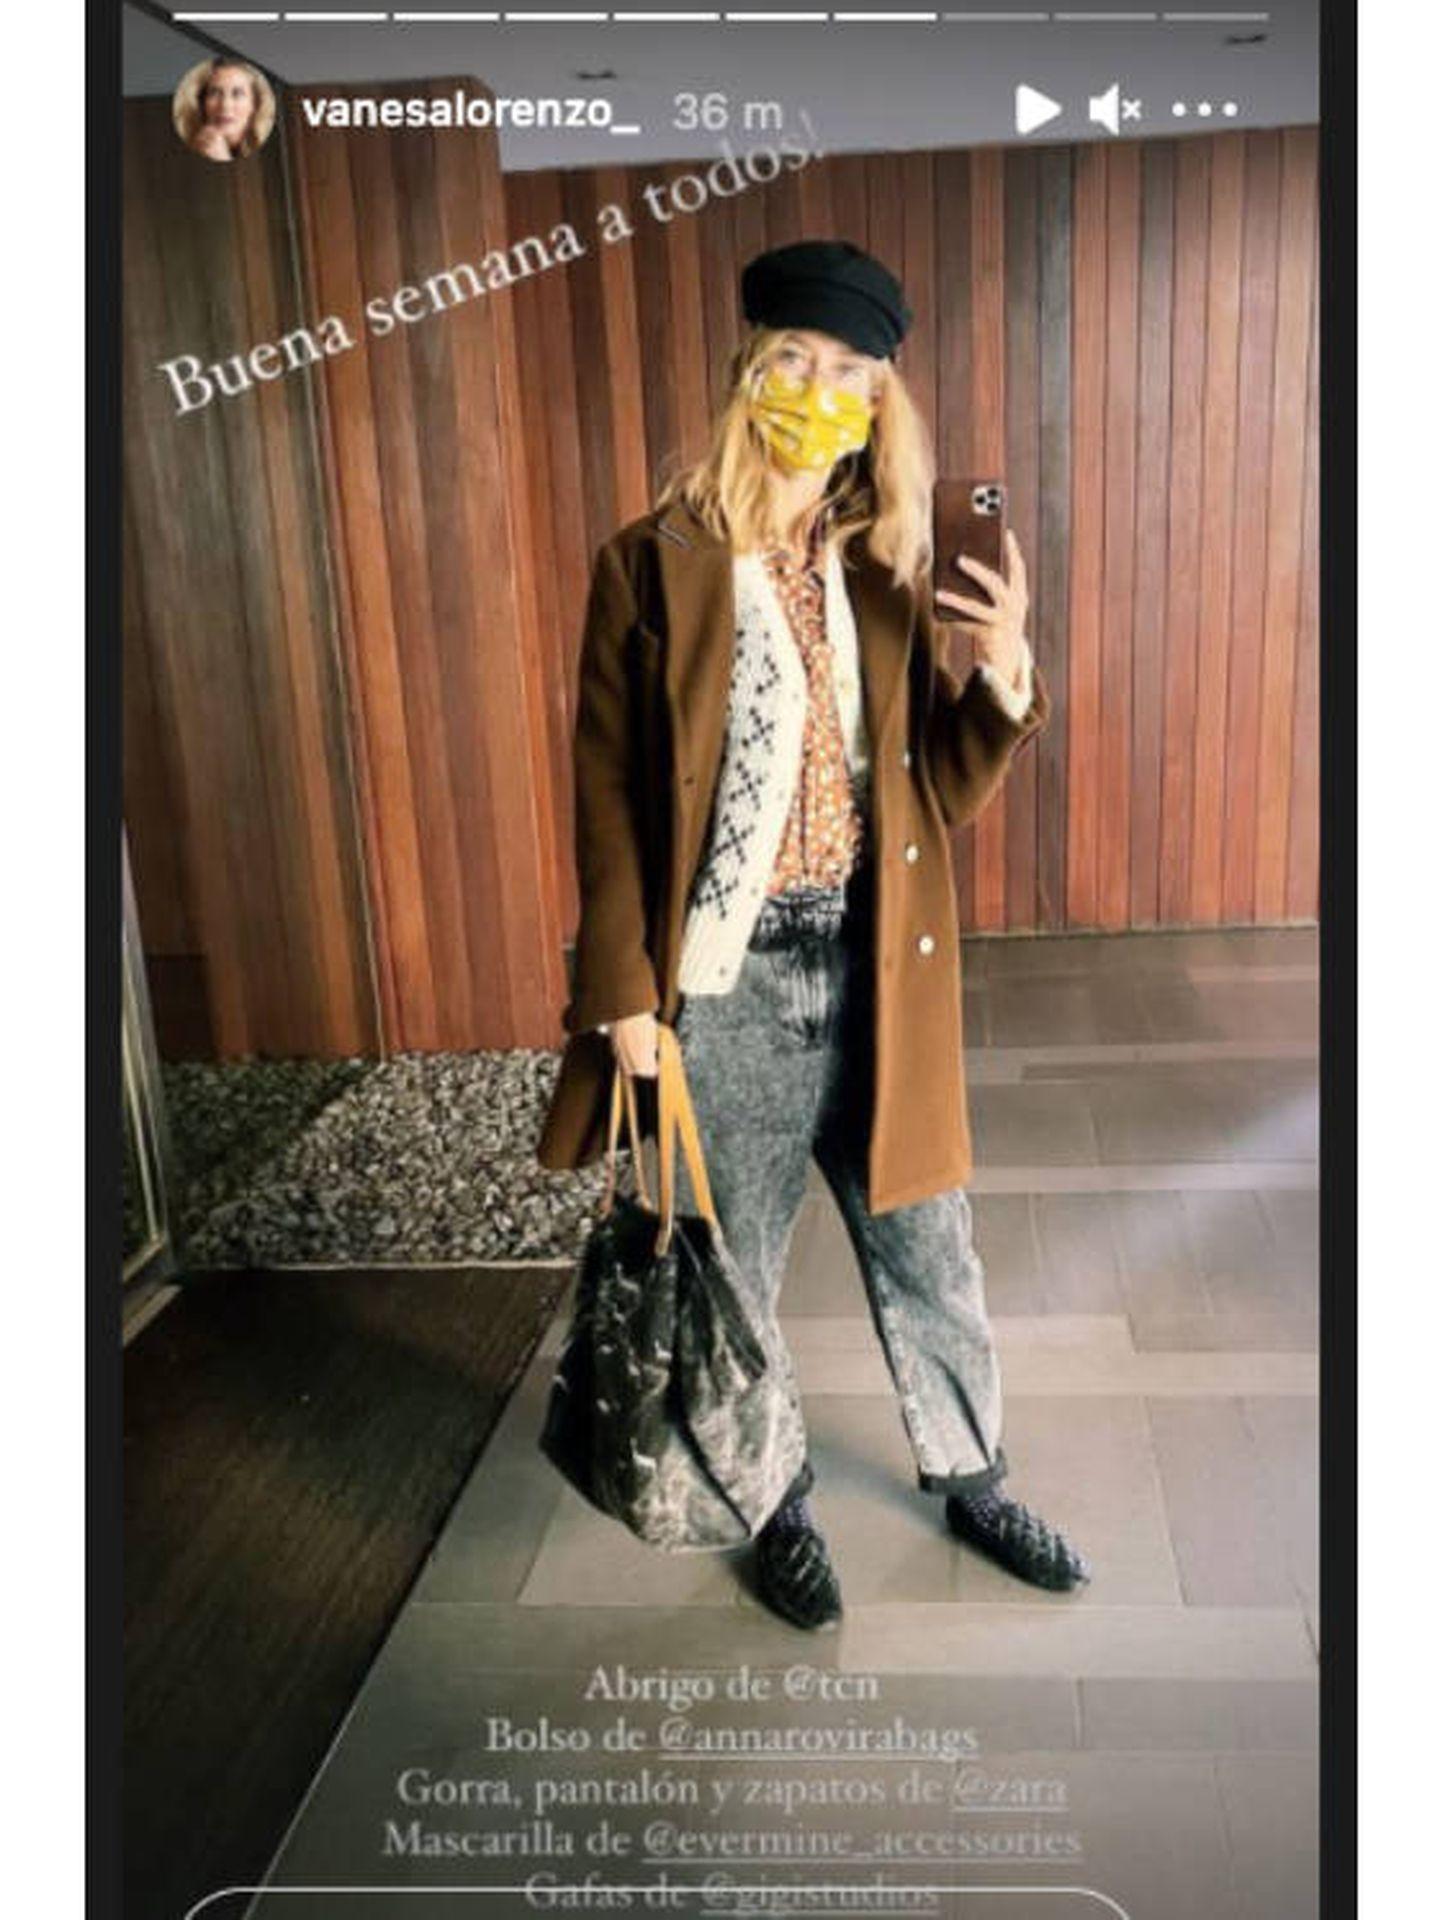 El nuevo look de Vanesa Lorenzo. (Instagram @vanesalorenzo_)